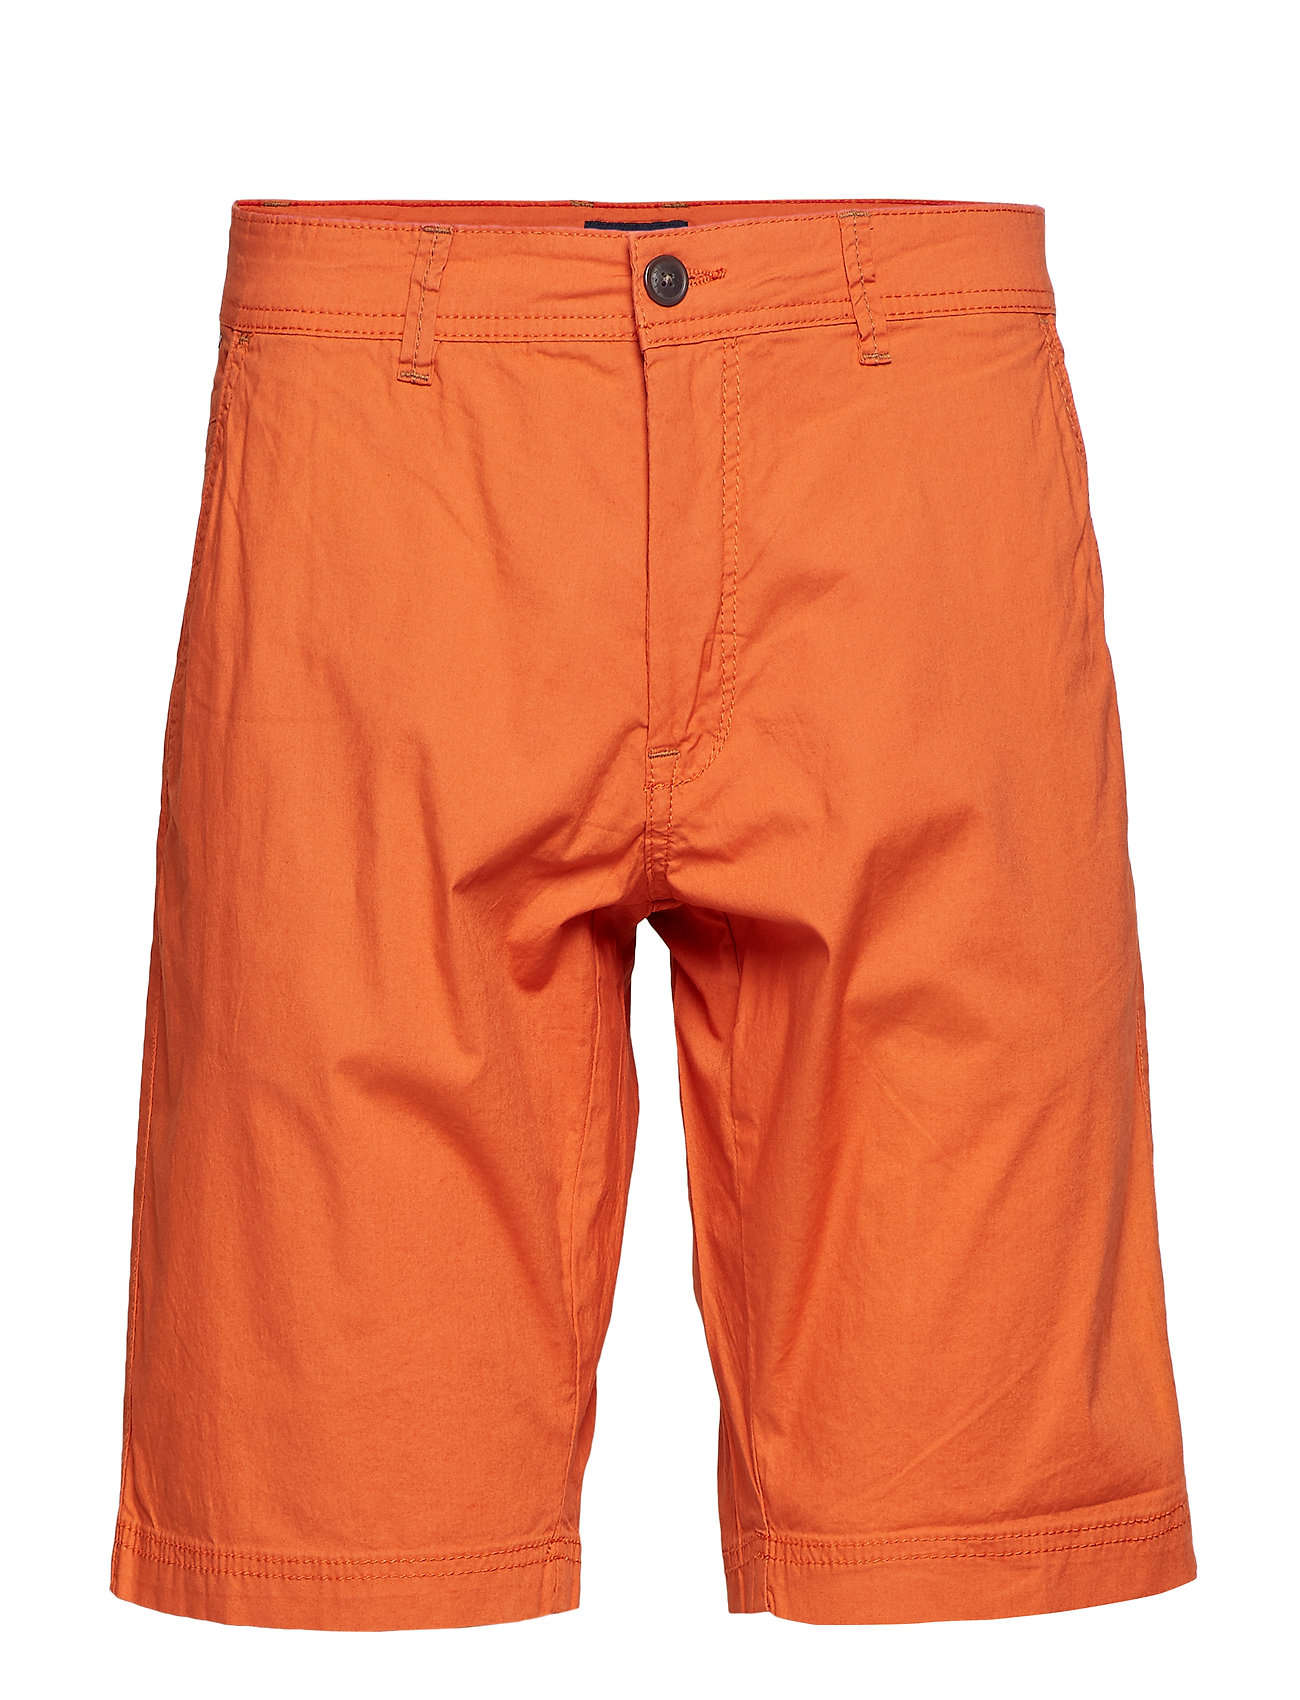 Signal Shorts - ORANGE RUST